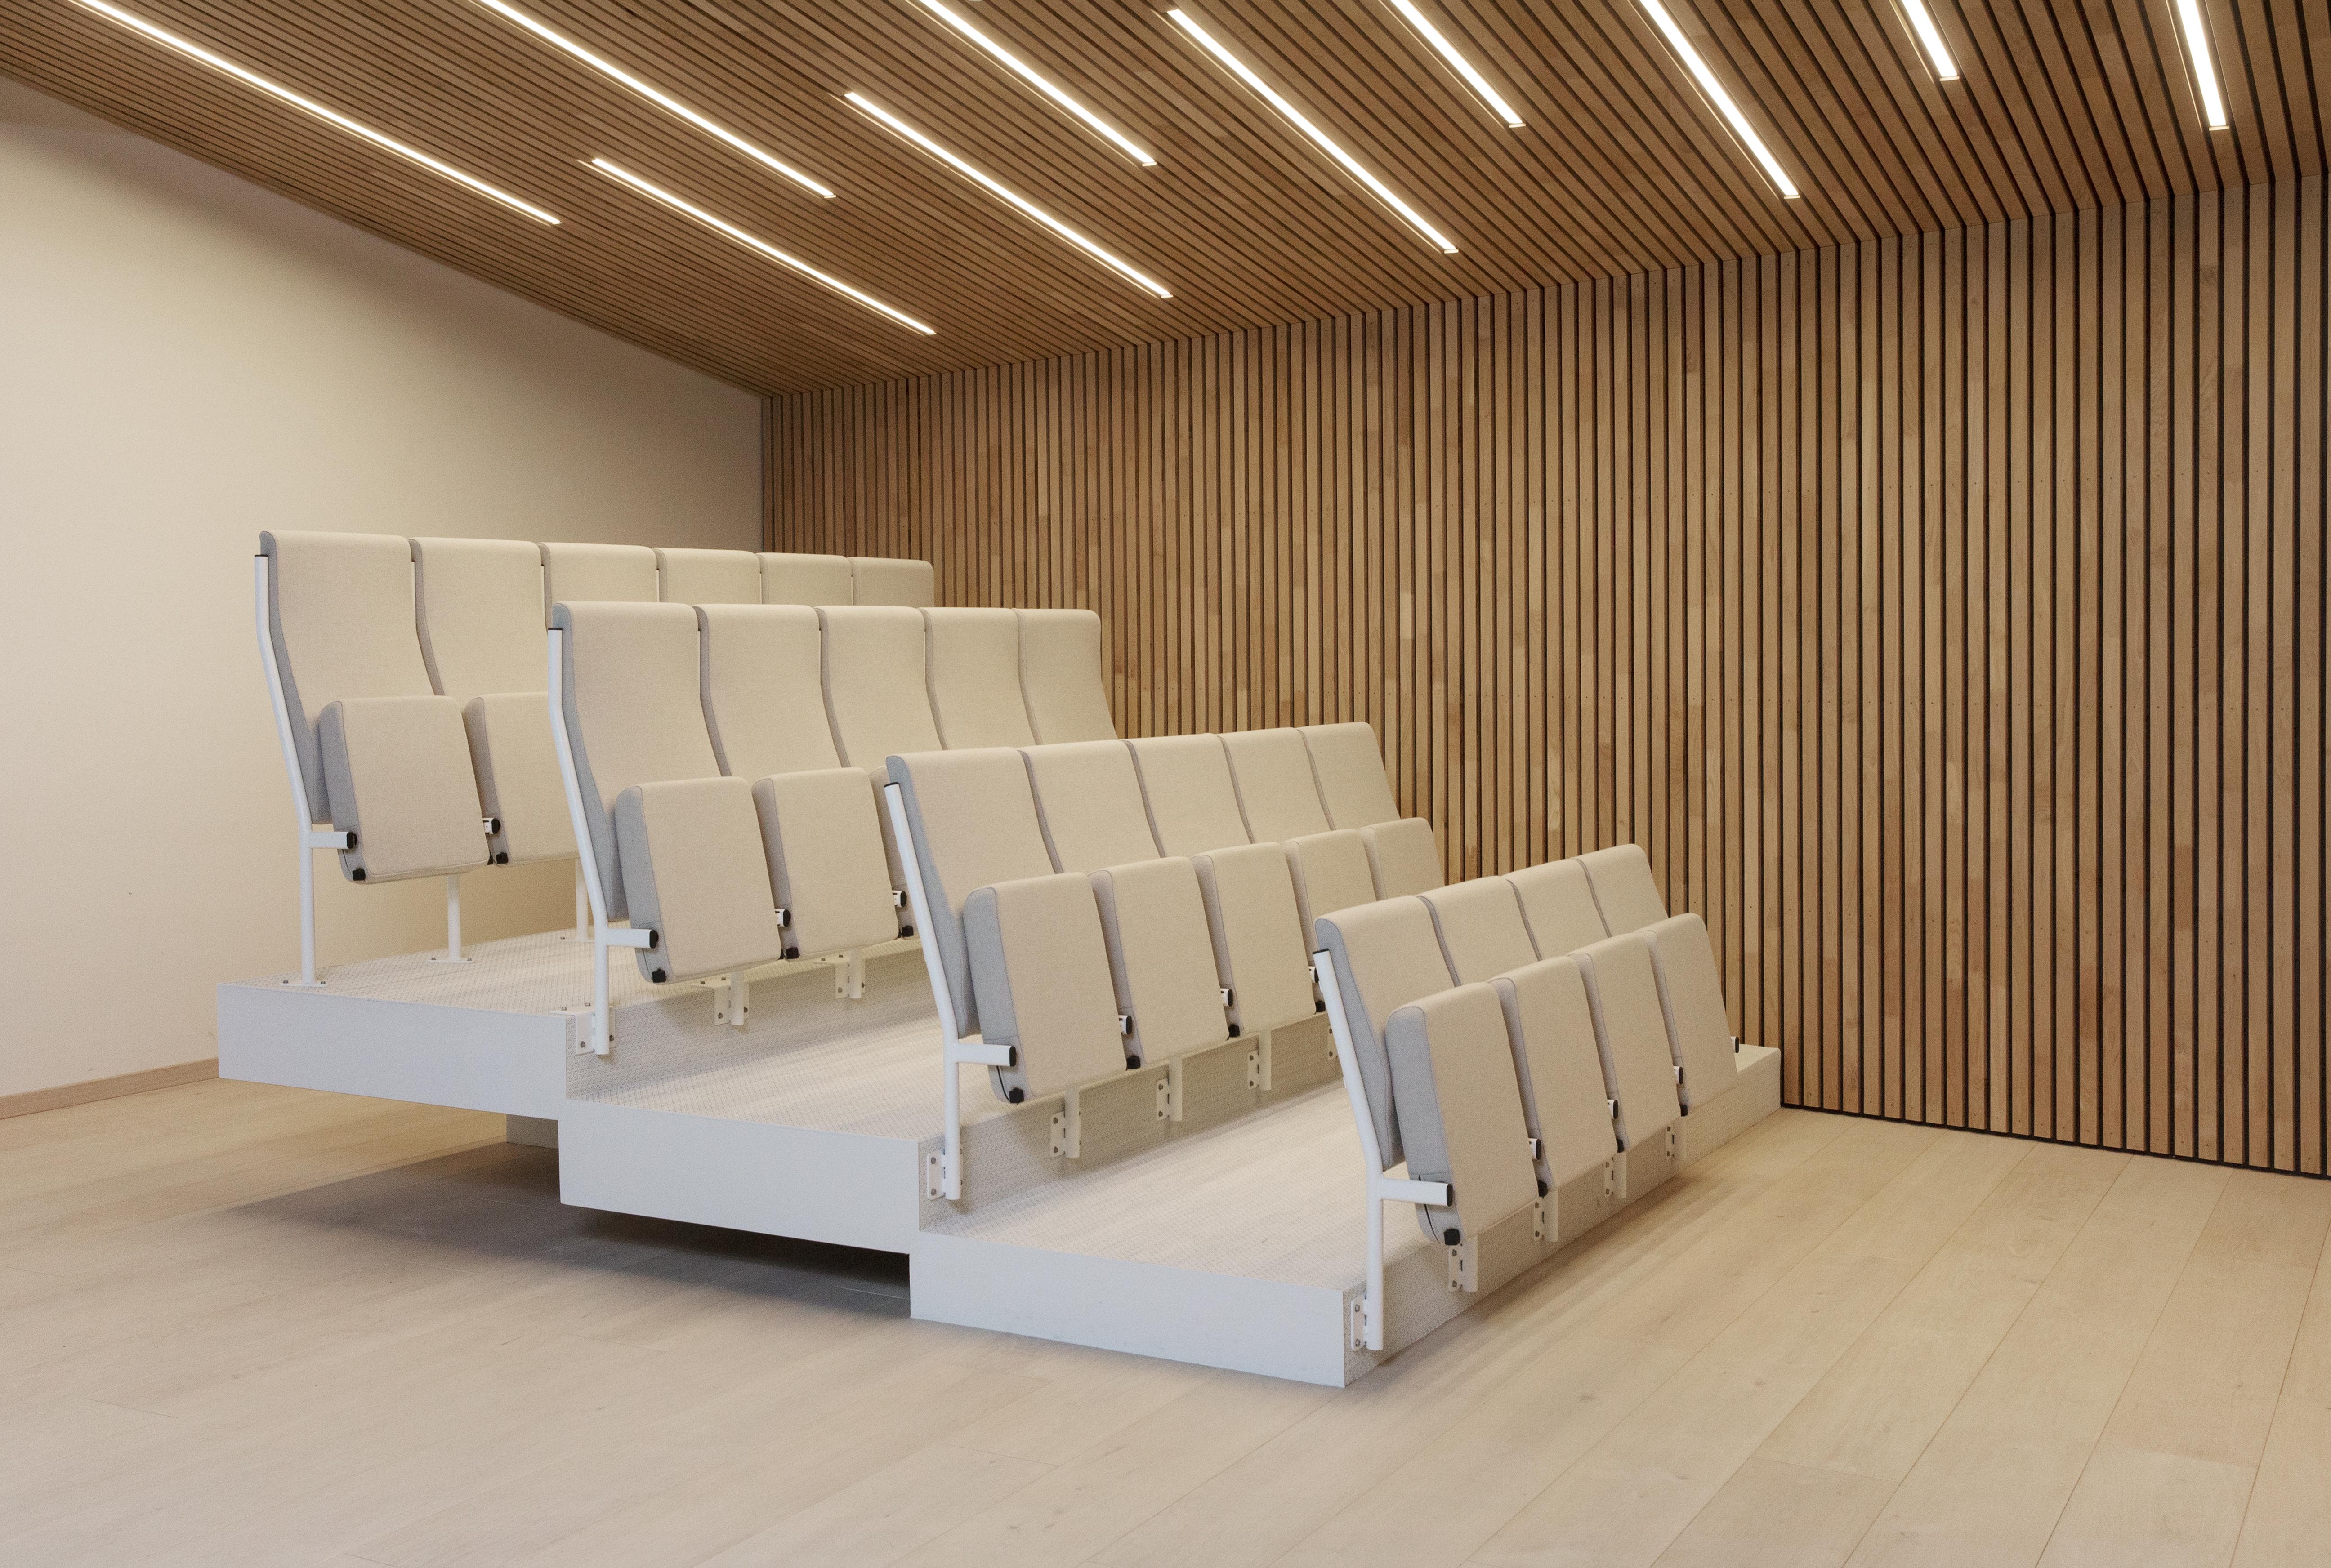 Audio auditorium i ulike rygg høyder Fora Form